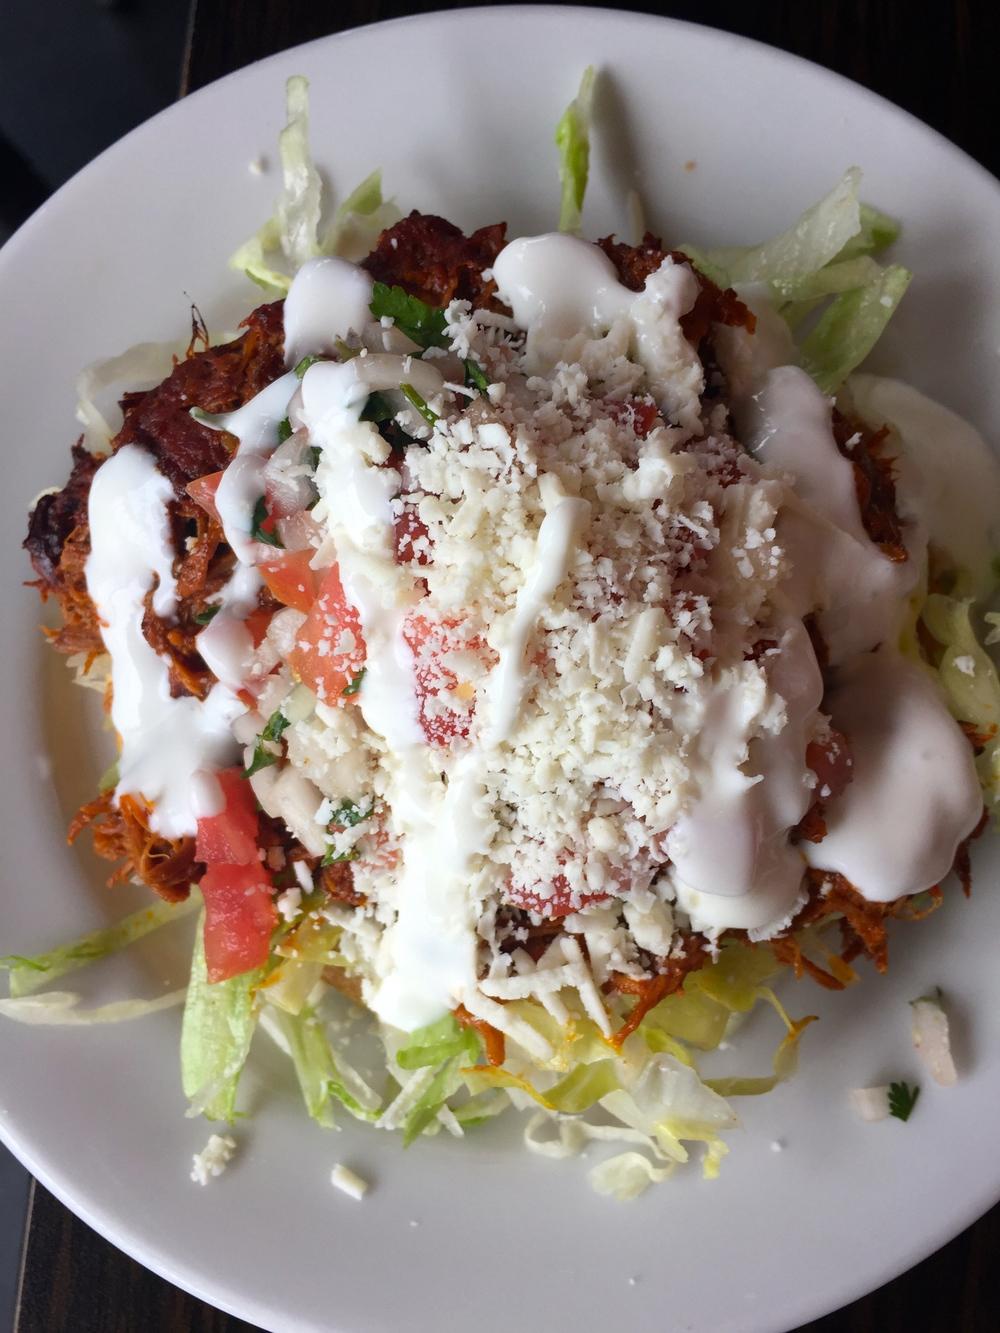 Yucatan-spiced shredded pork Cochinita Pibil Sope, with lettuce, crema, and queso fresco.